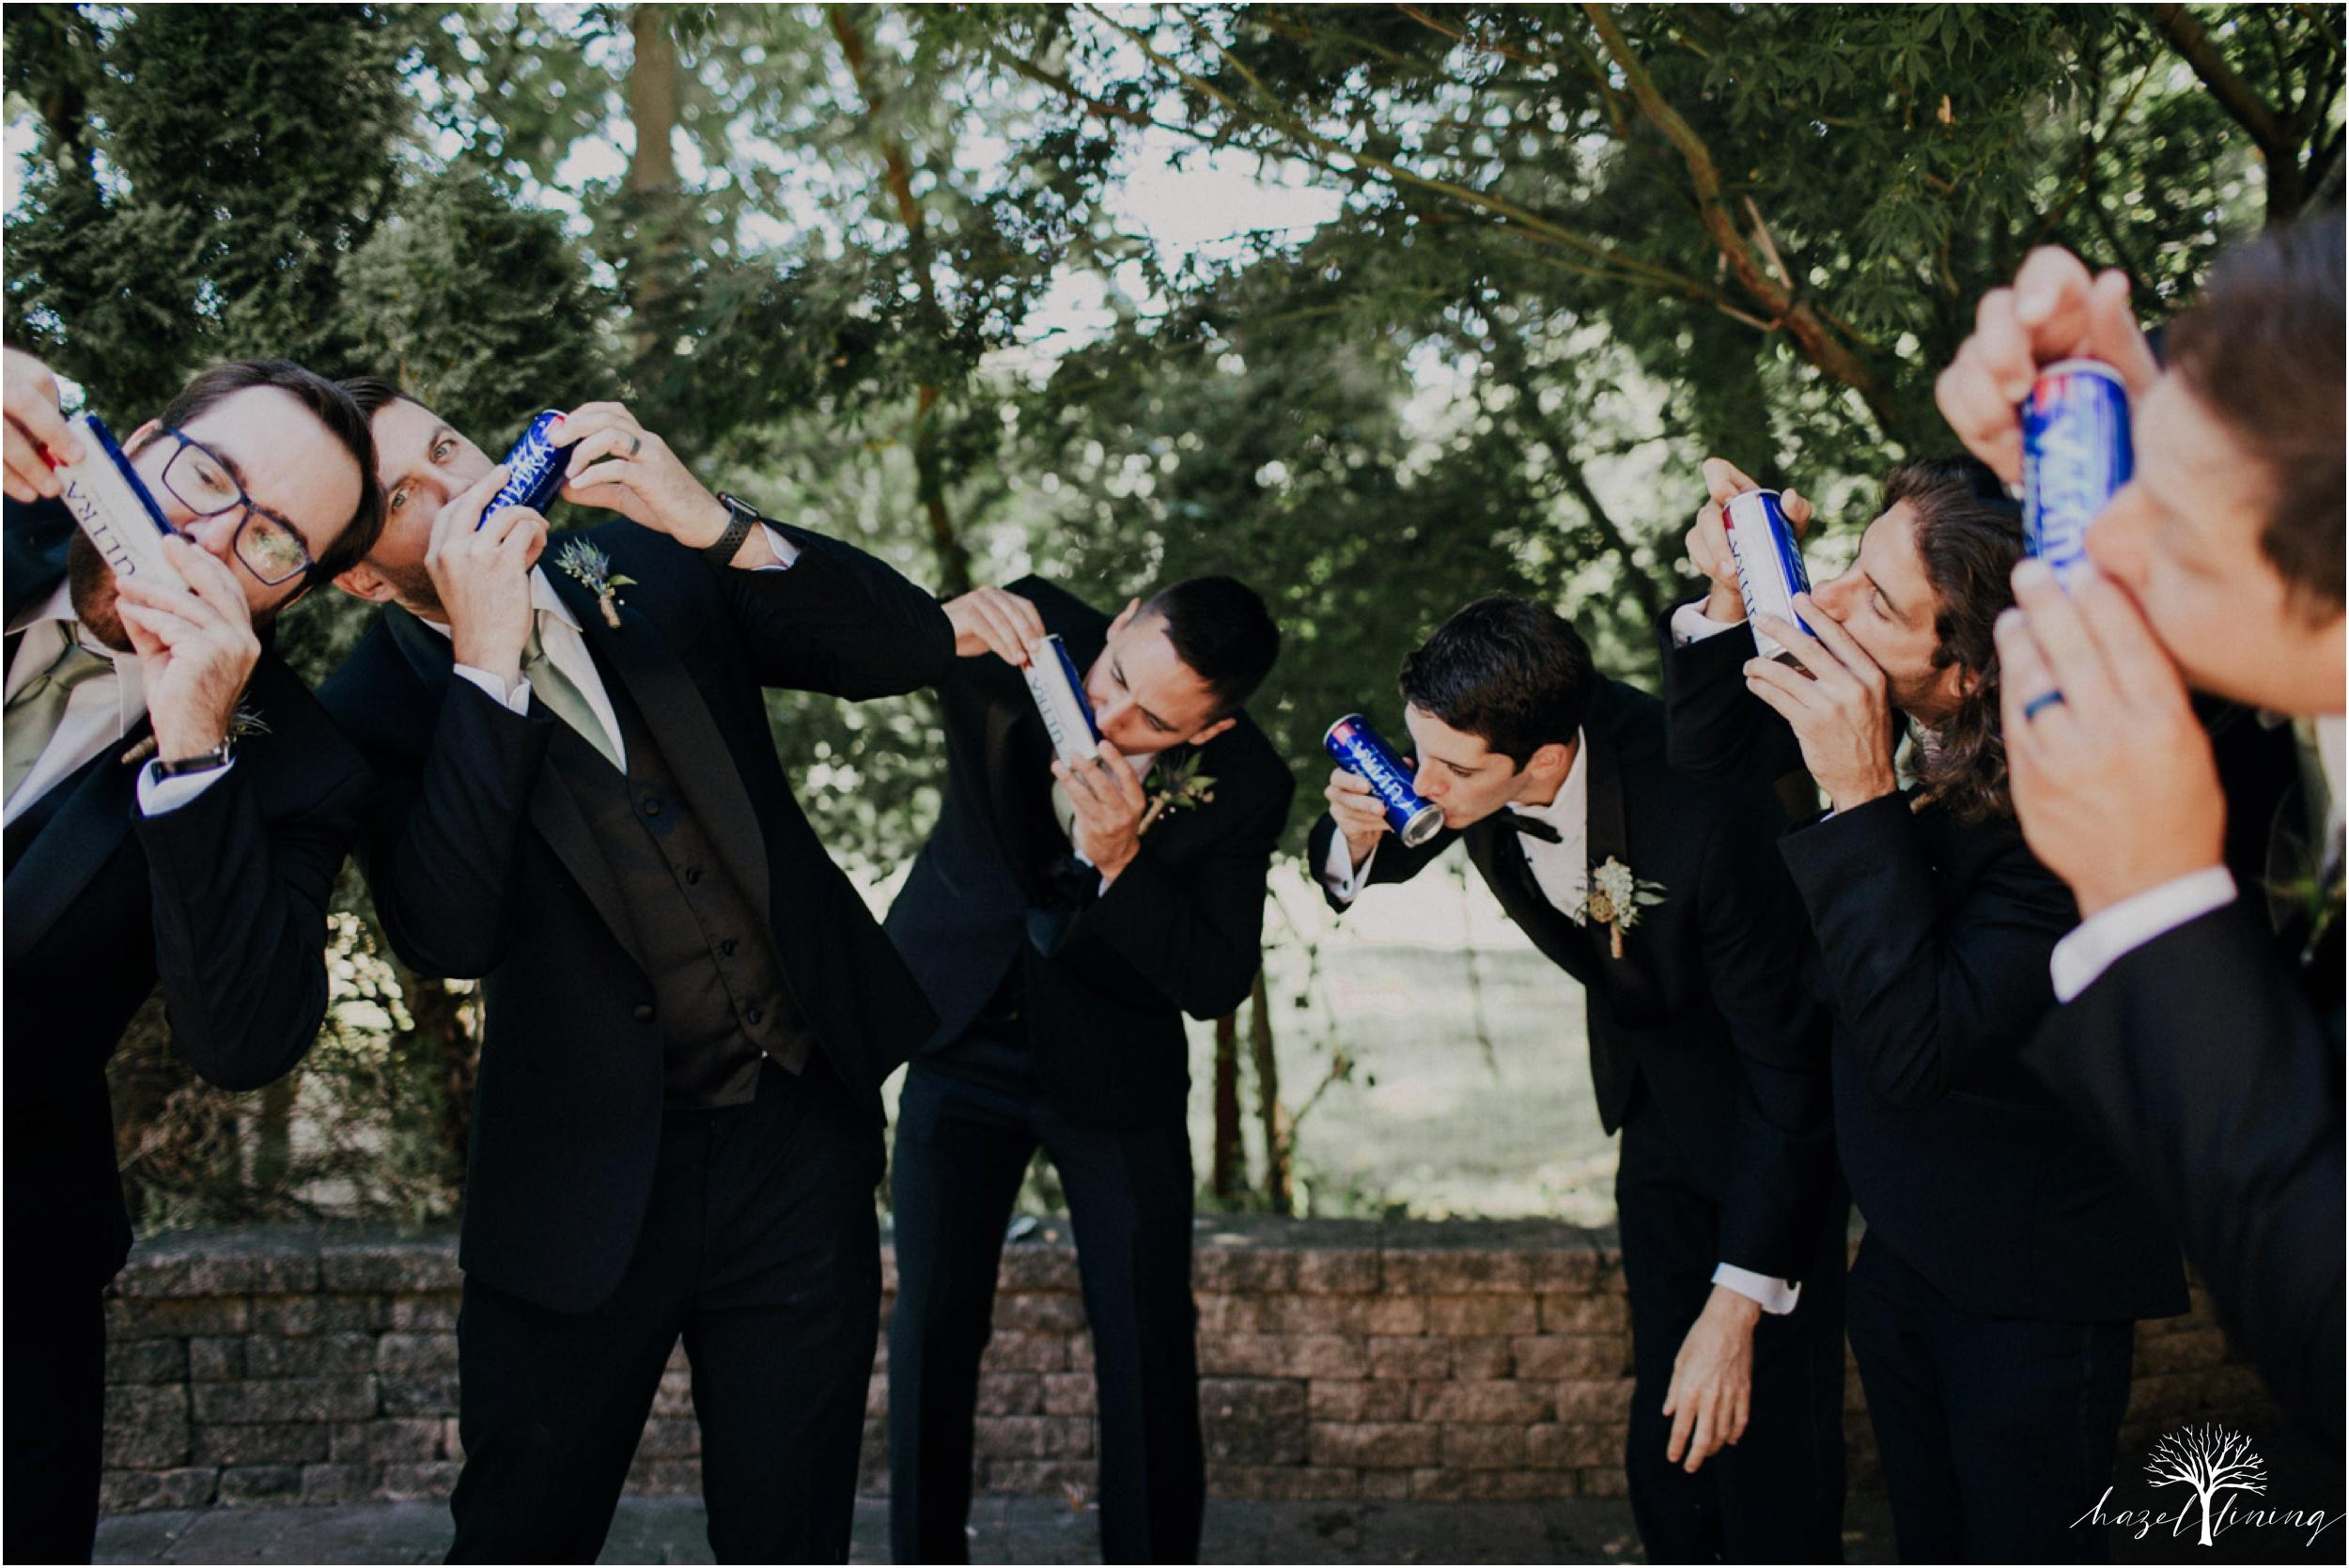 maureen-hepner-anthony-giordano-rose-bank-winery-newtow-pennsylvania-luxury-summer-wedding-hazel-lining-photography-destination-elopement-wedding-engagement-photography_0055.jpg